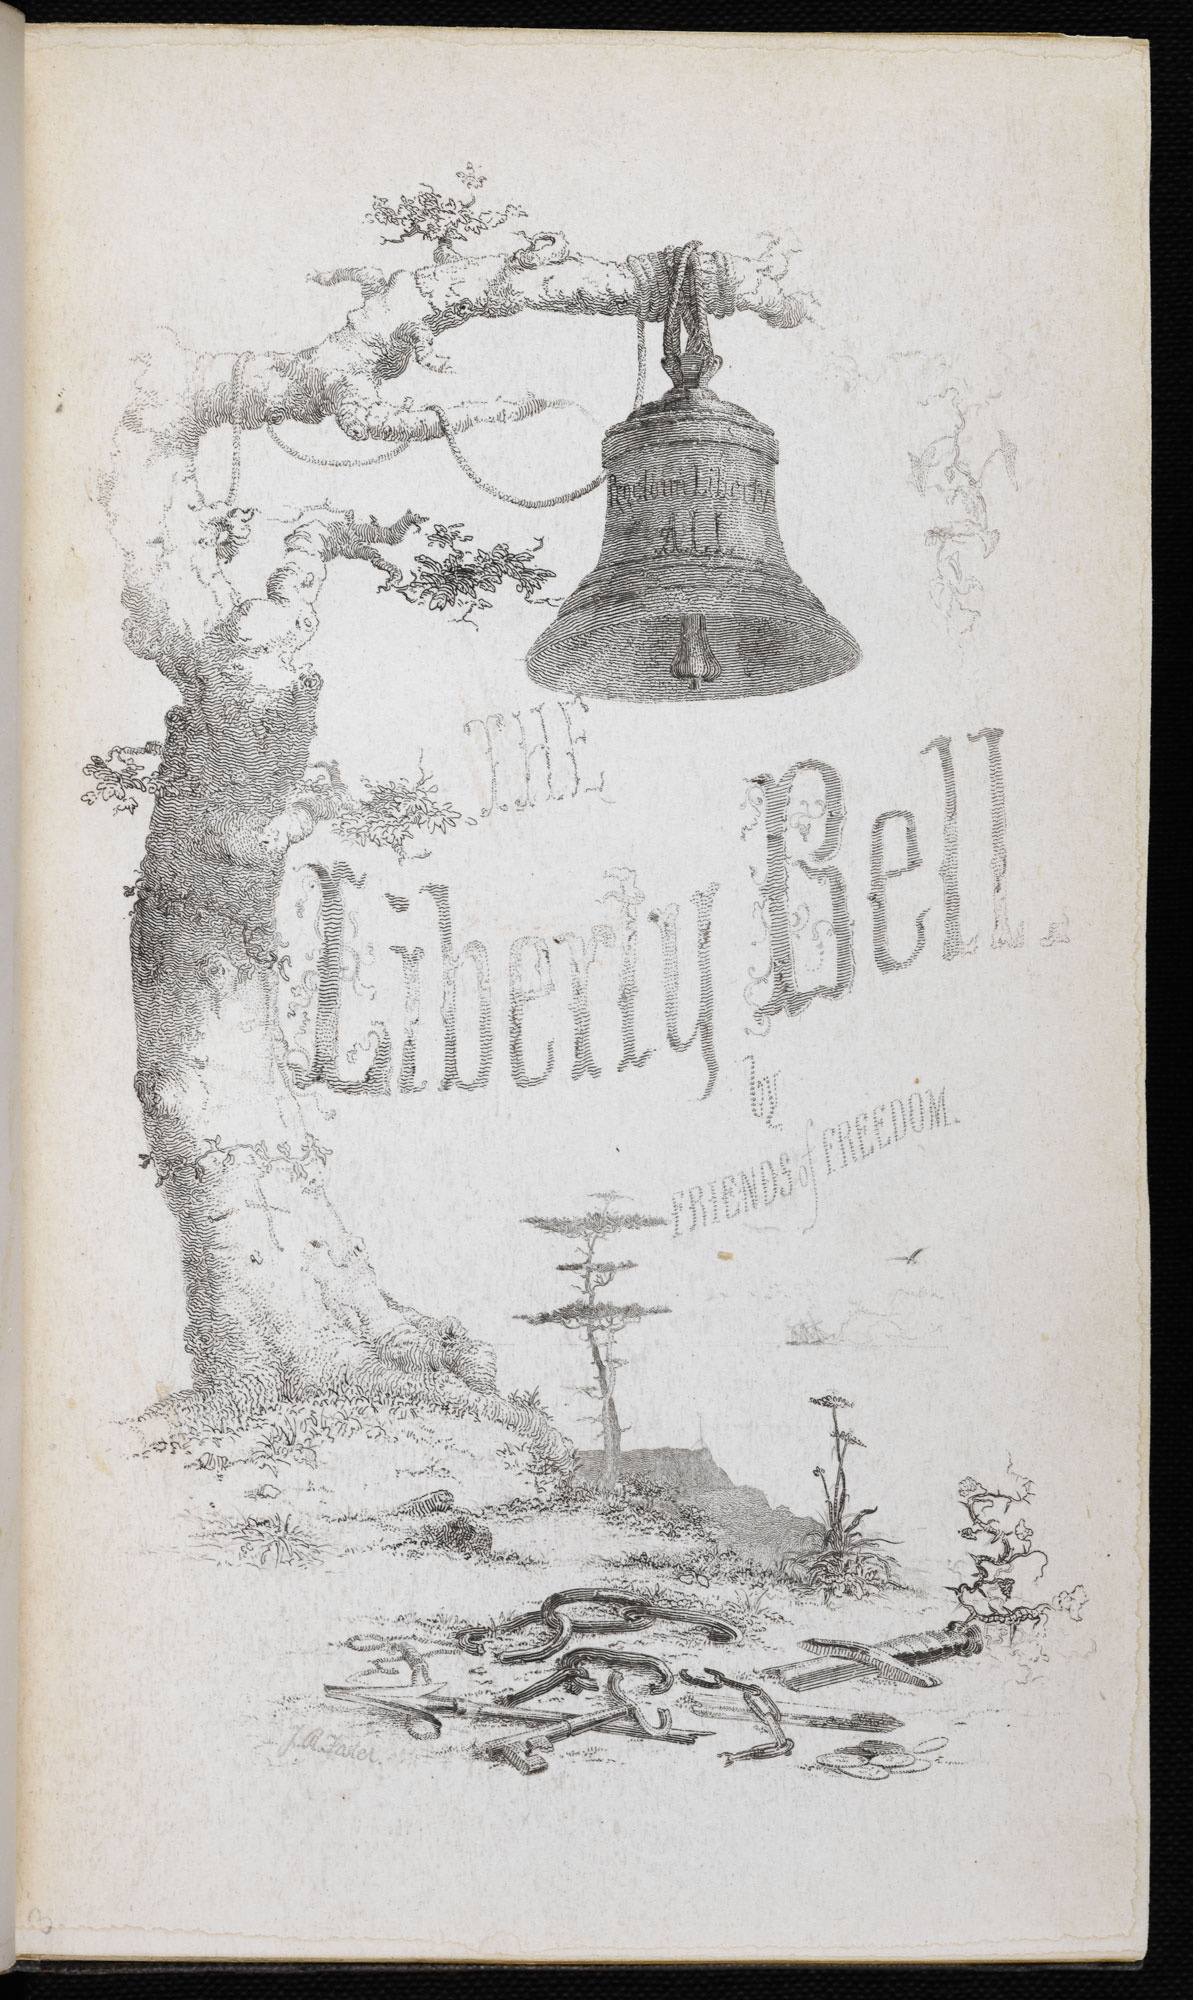 Amercan abolitionist literature magazine [page: Year MDCCCXLV p. 209]